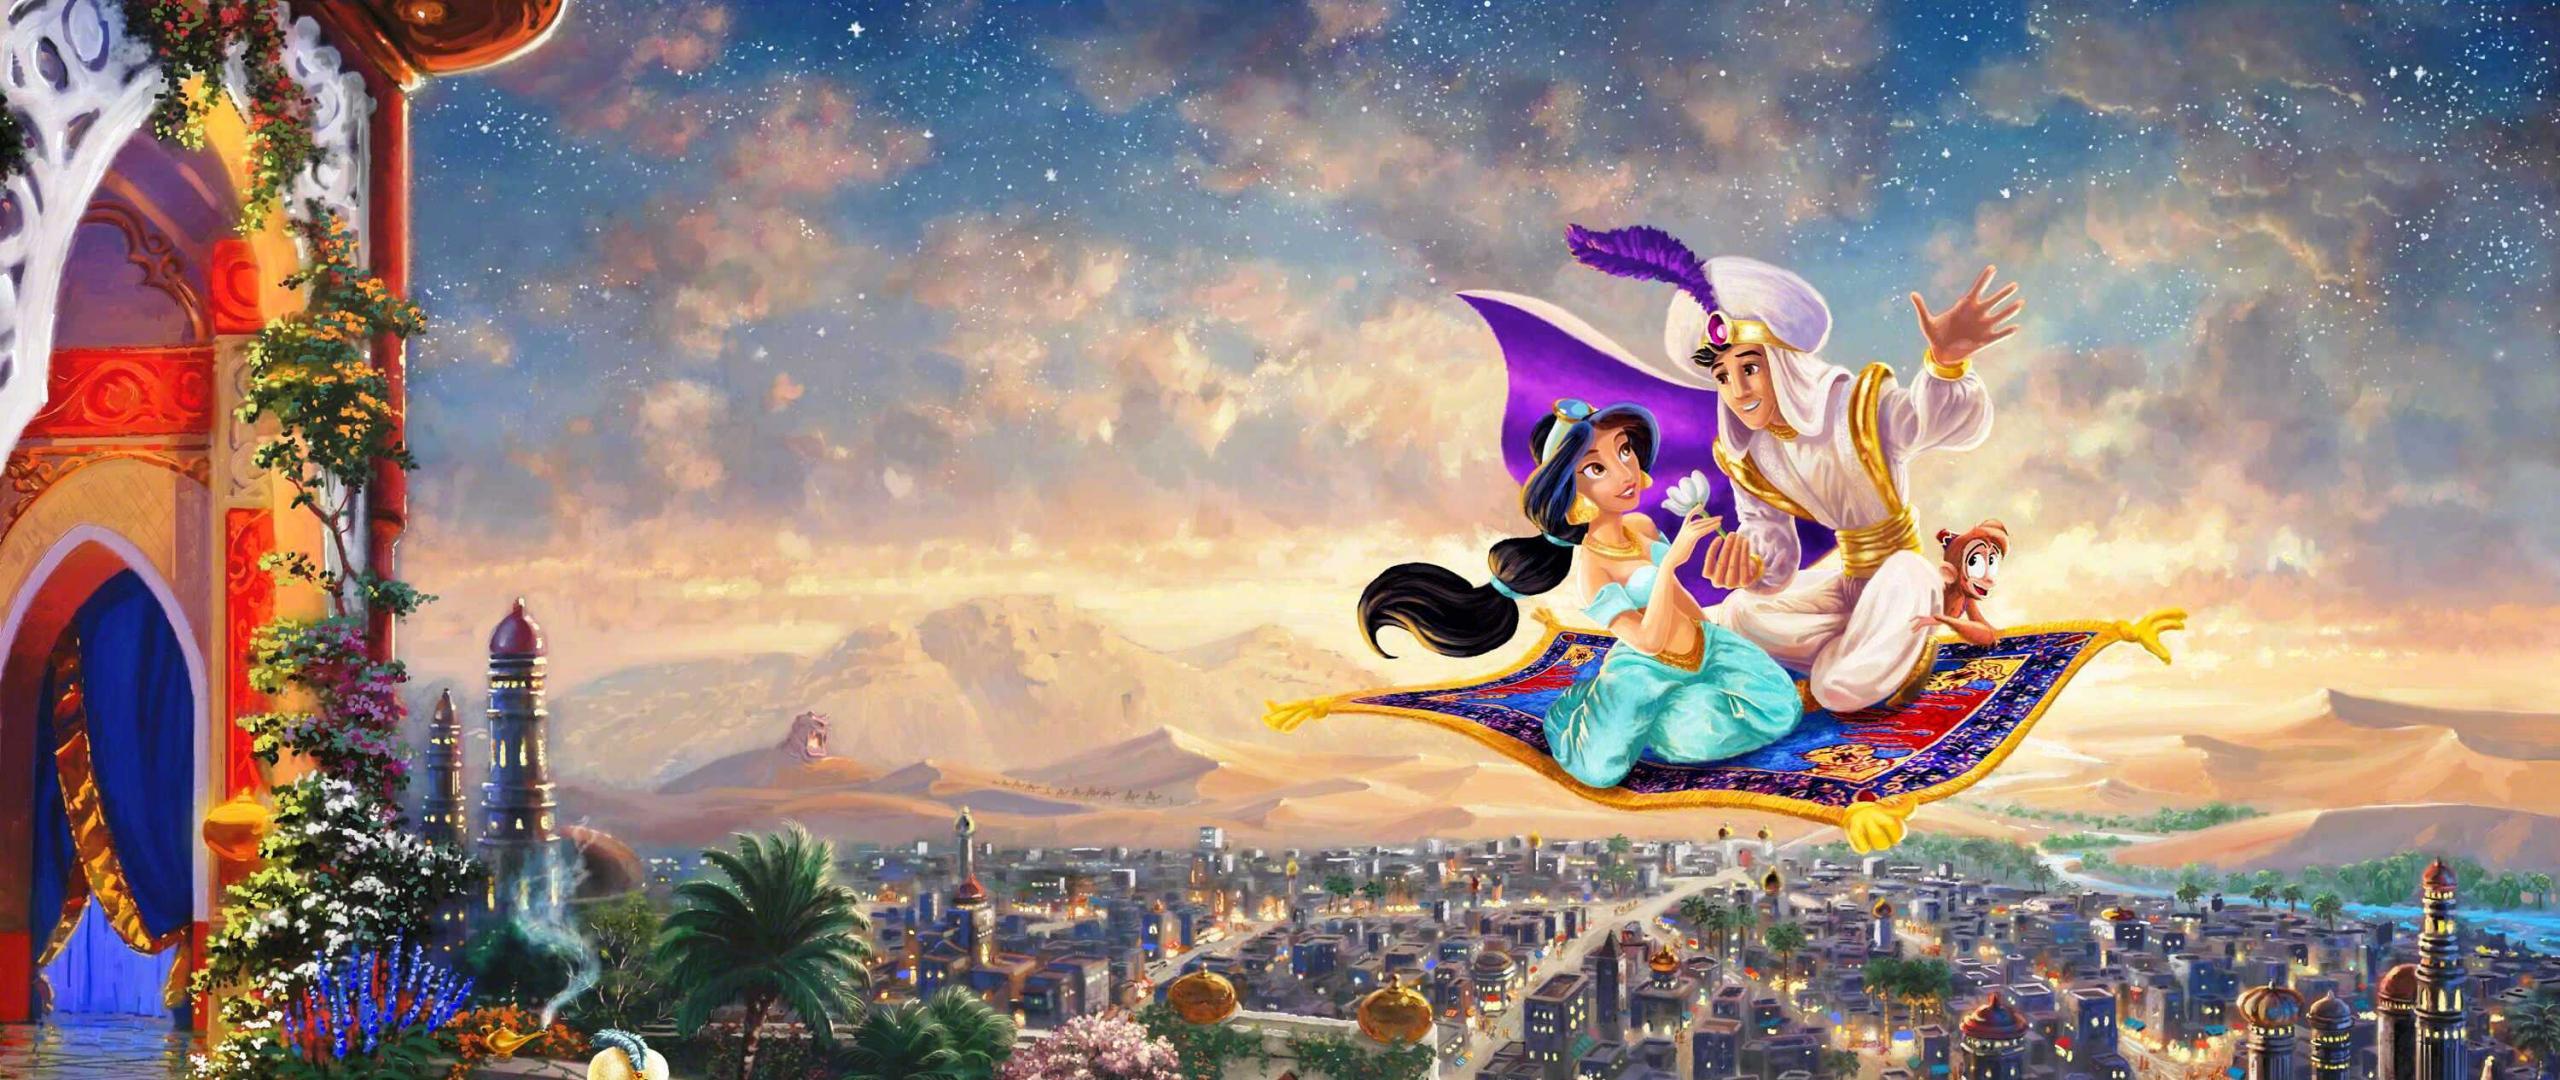 Free Wallpaper Fall Season Aladdin Wallpapers Hd Pixelstalk Net